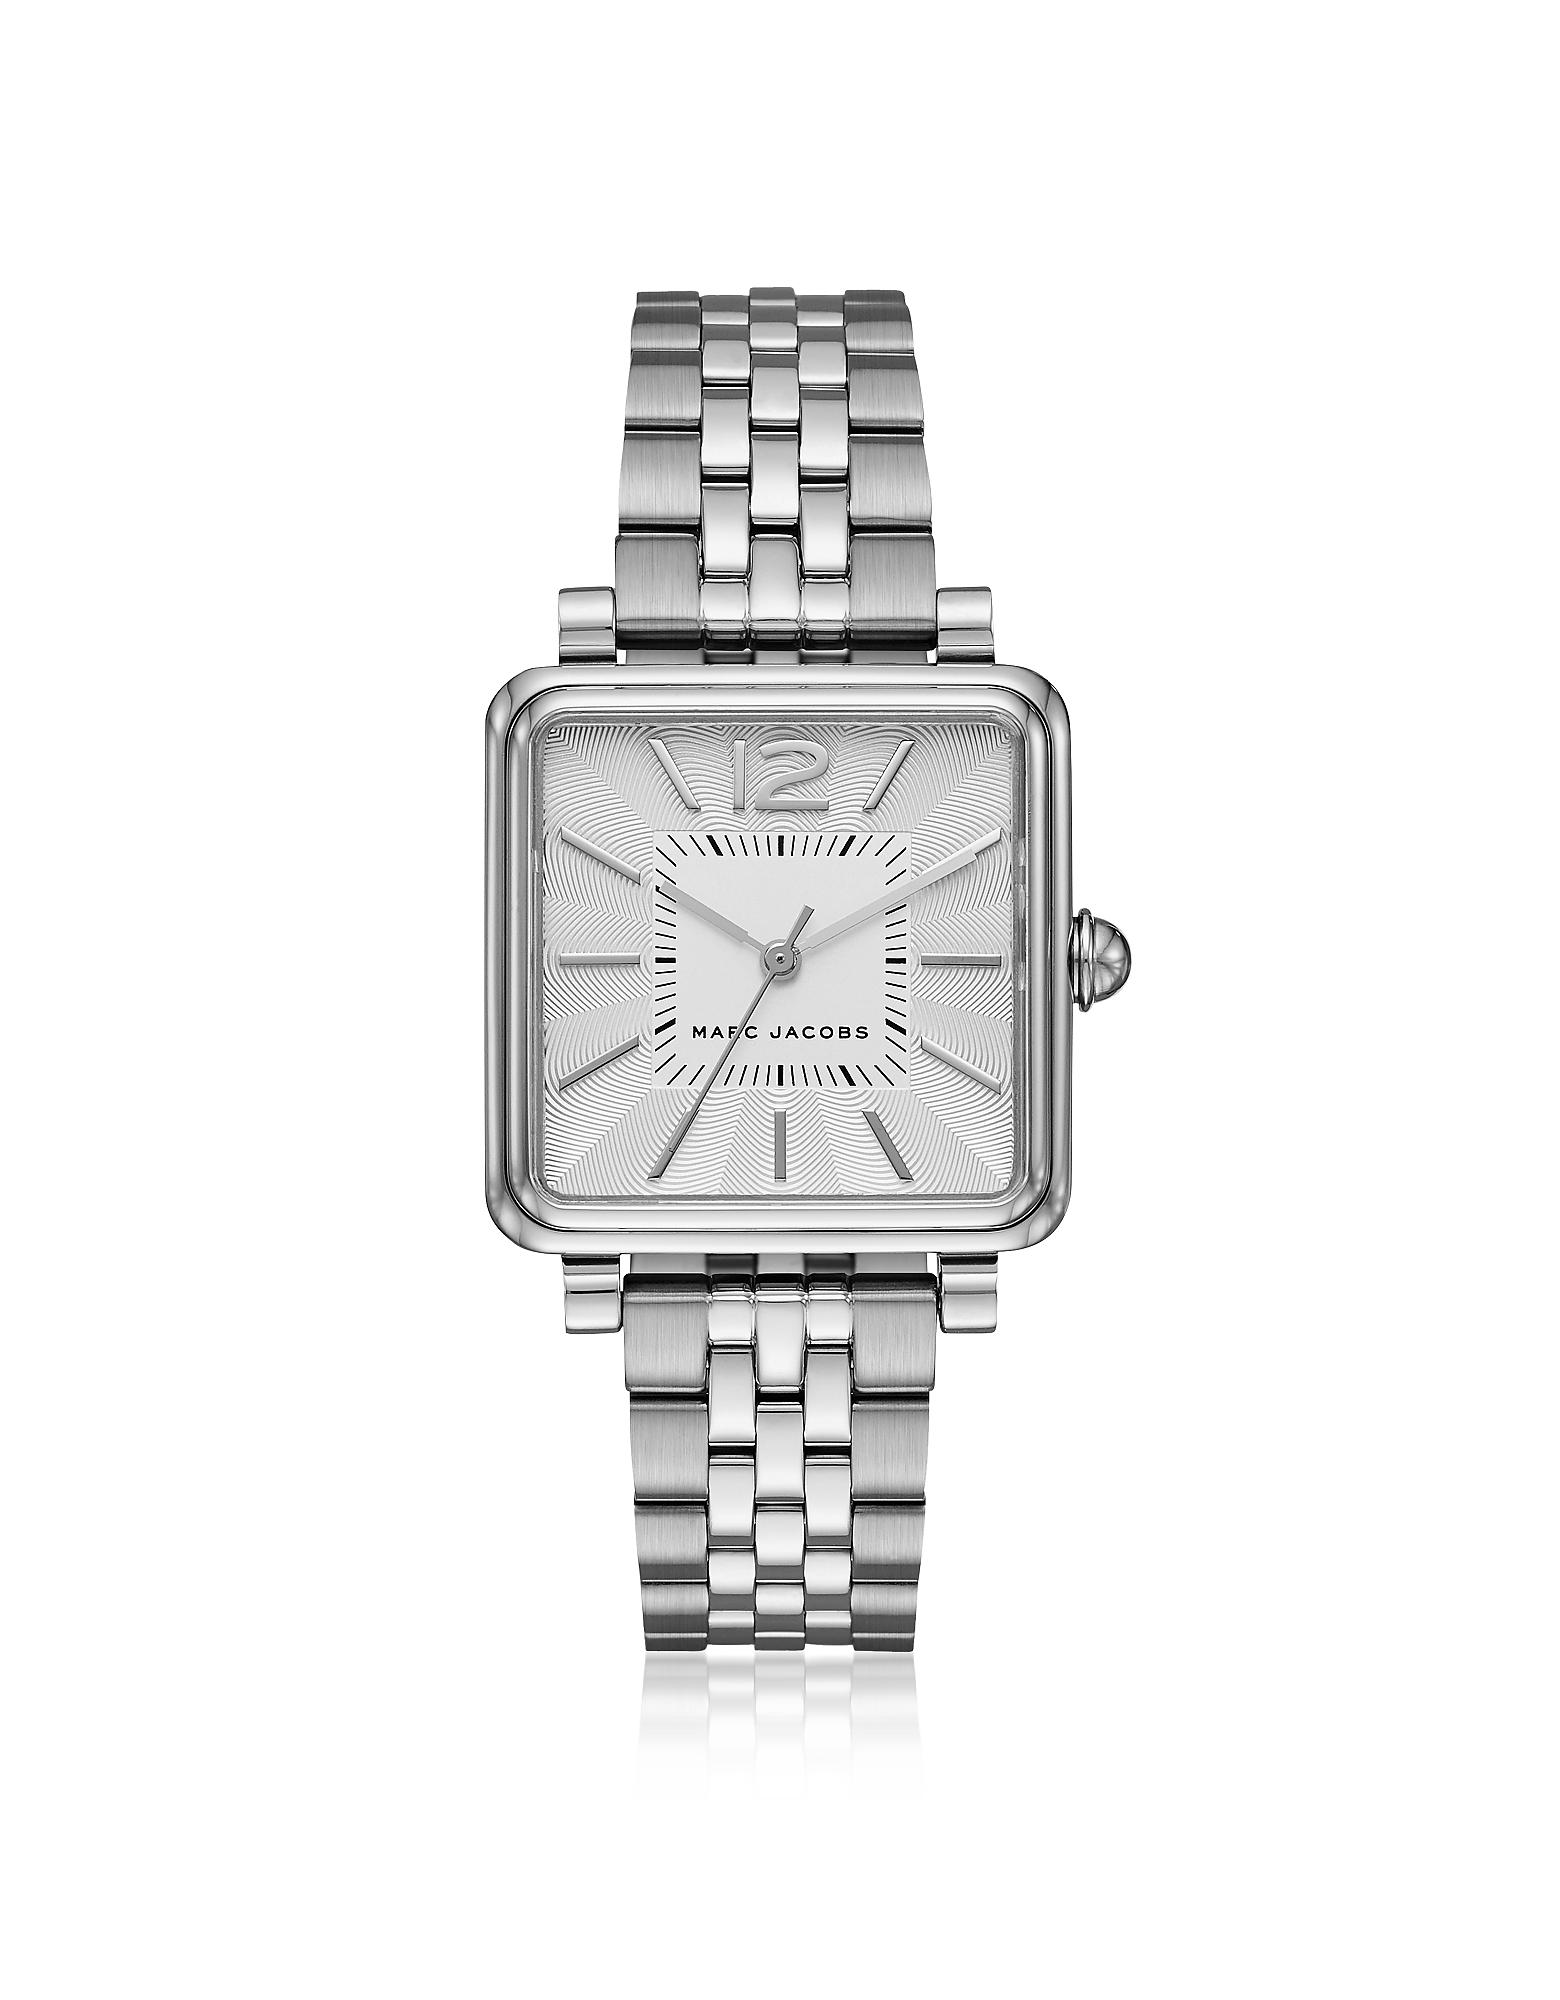 Marc Jacobs Women's Watches, Vic Silver Tone Women's Watch